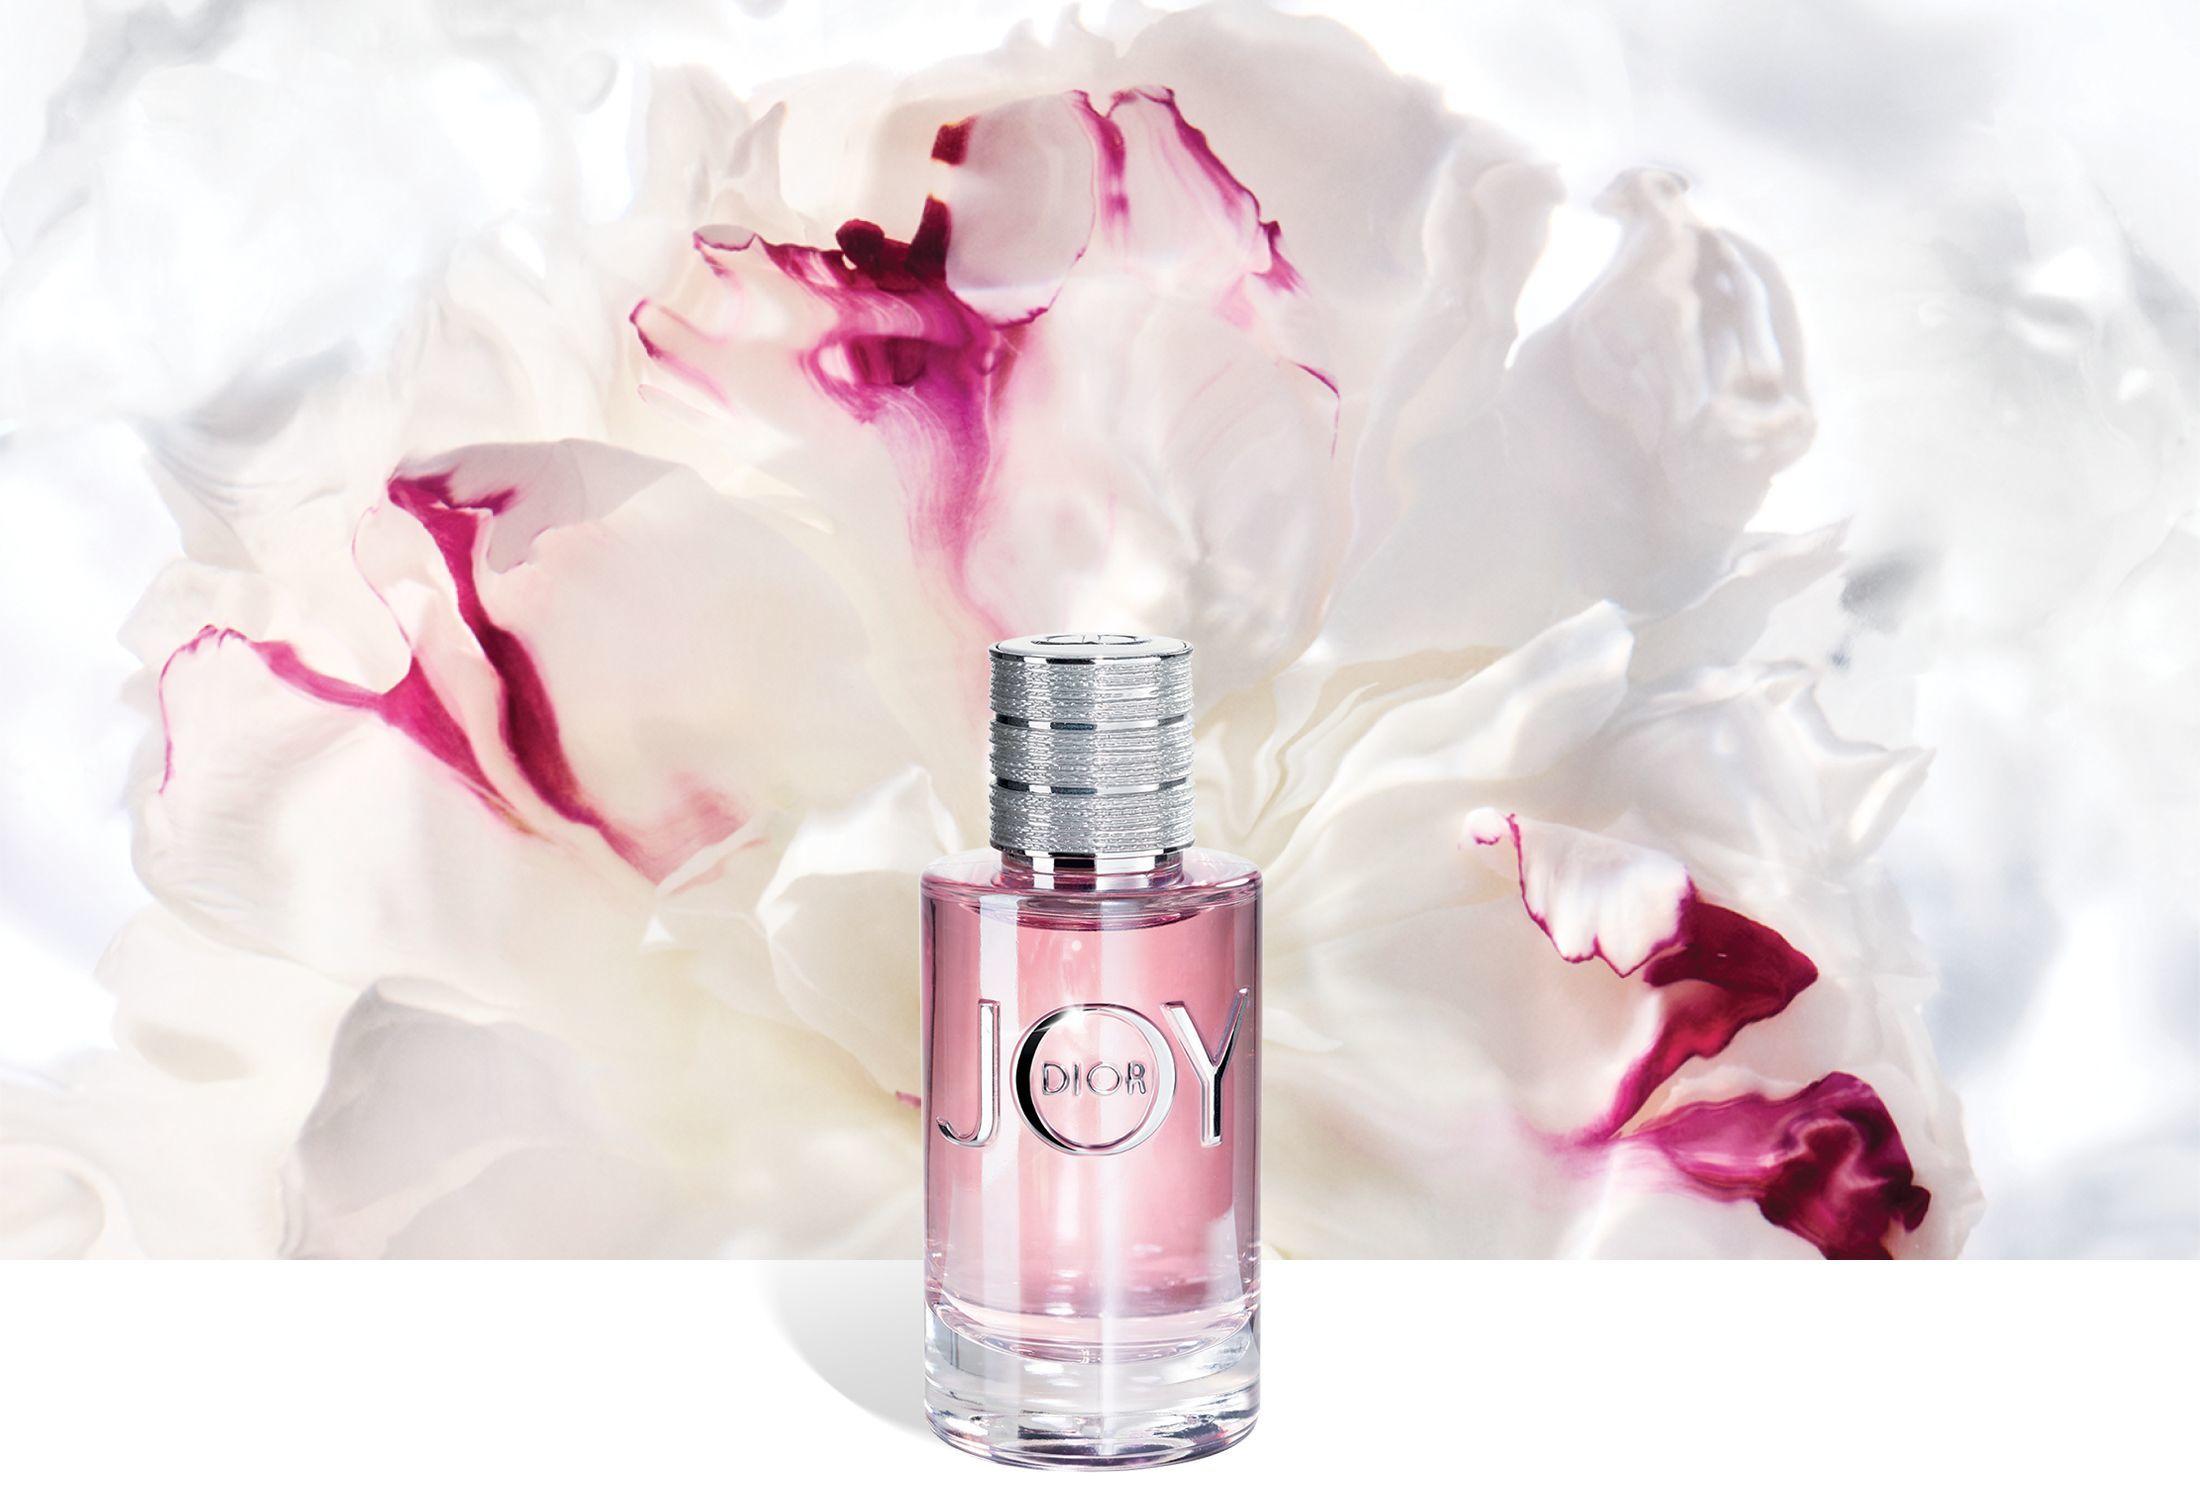 Nước hoa Dior Joy